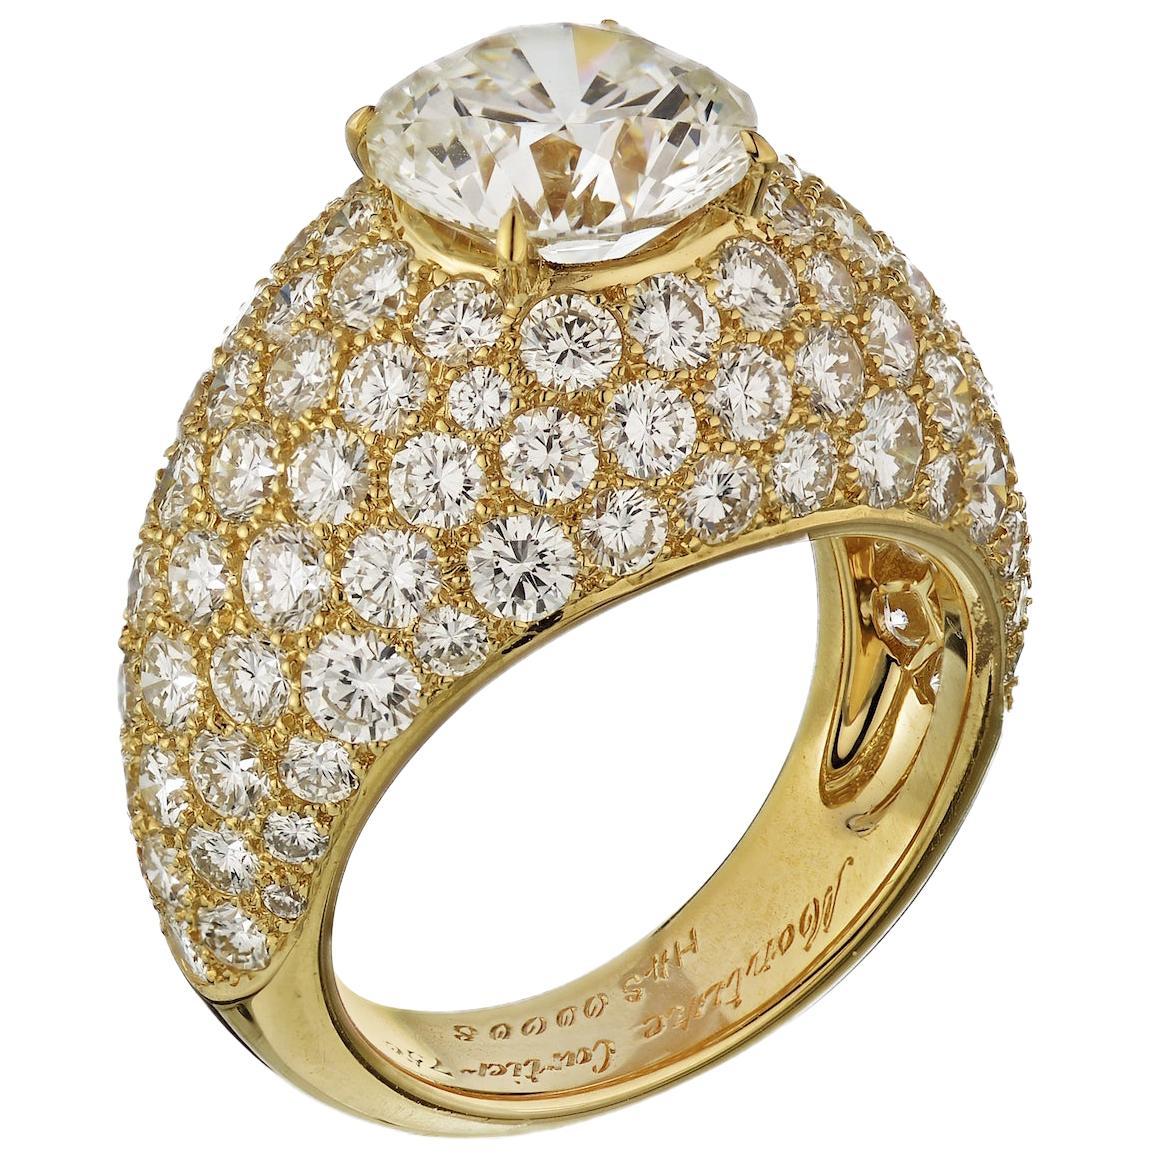 Cartier Yellow Gold Round Cut Diamond Engagement Ring 3 Carat